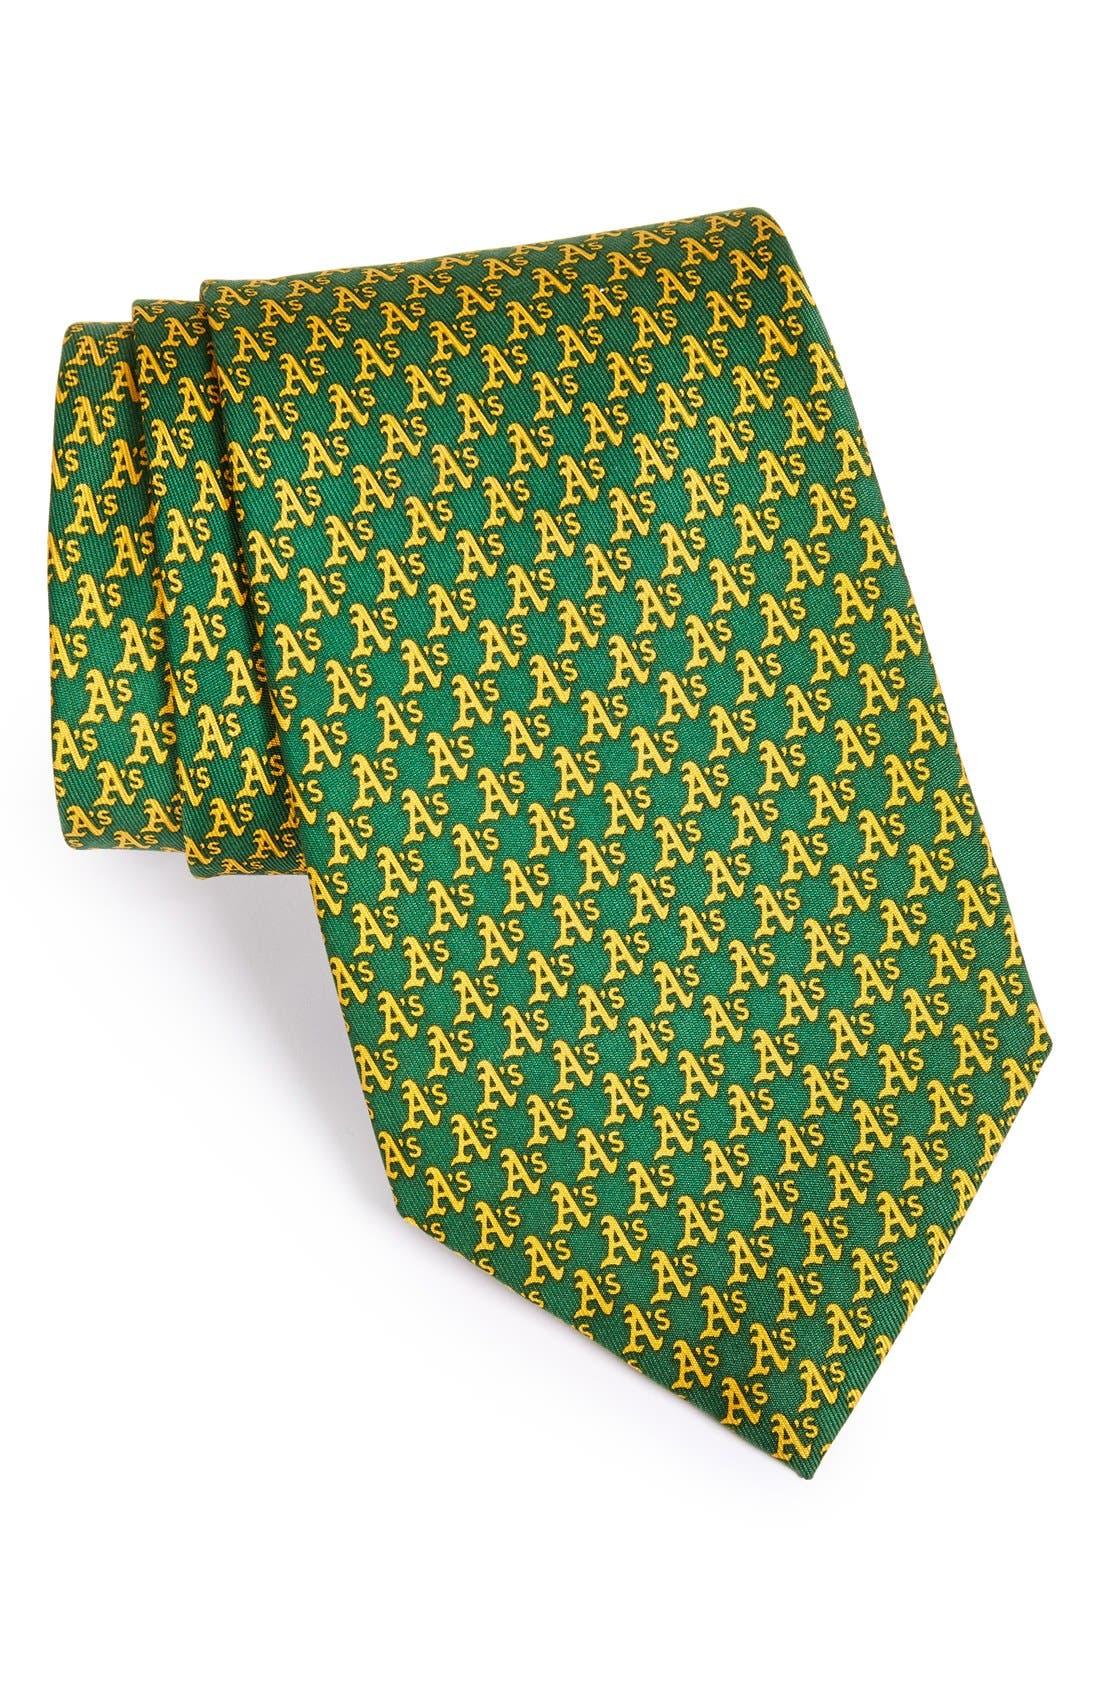 Oakland Athletics - MLB Woven Silk Tie,                         Main,                         color, Green